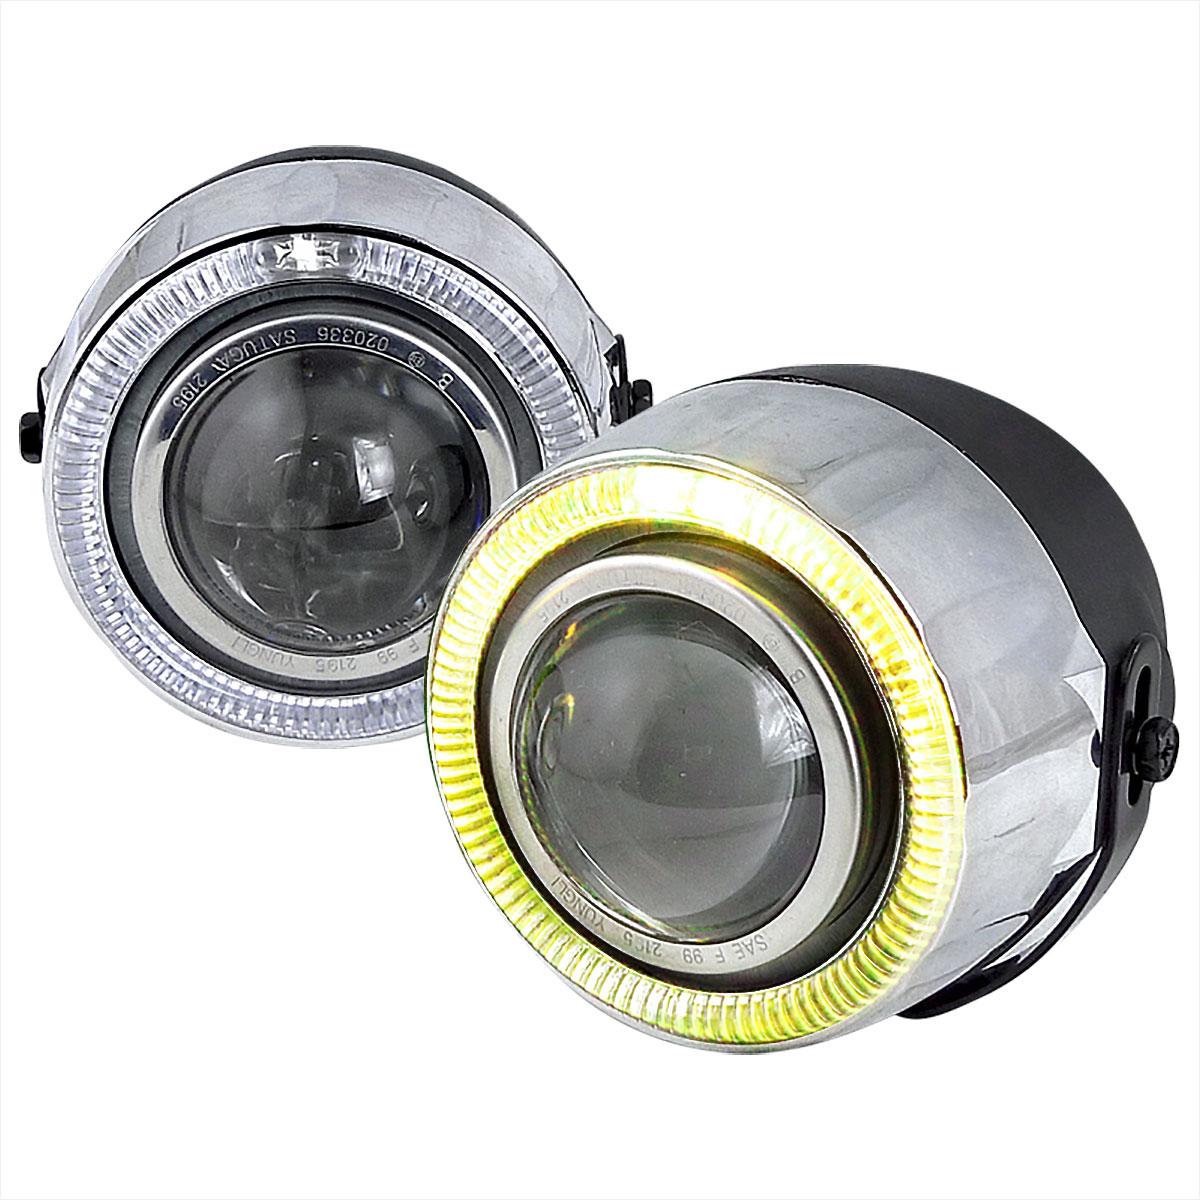 Spec-D Tuning LFP-RND-YL - Spec-D Halo Fog Light Projector - 7 Color